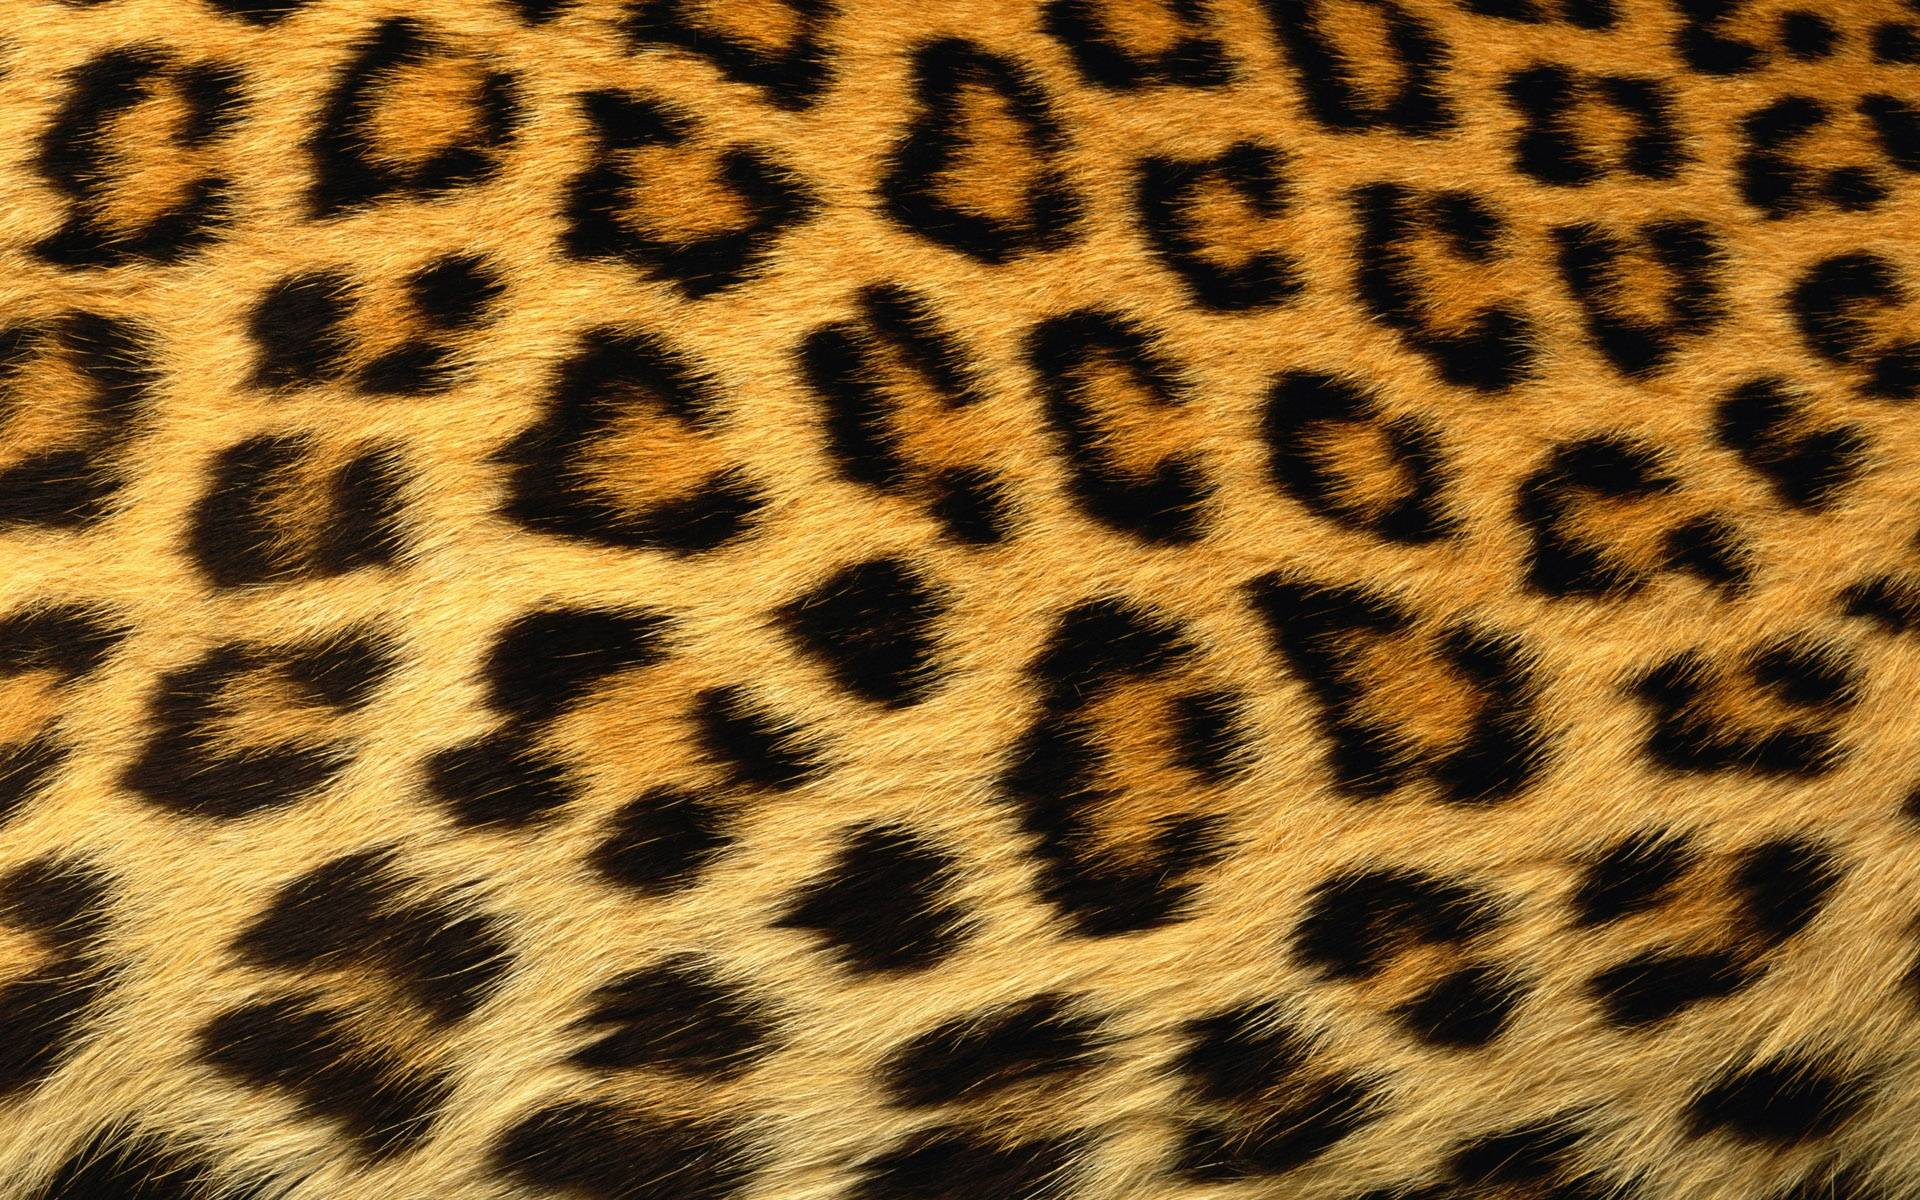 Leopard Print Wallpaper Bedroom Animal Print Wallpaper